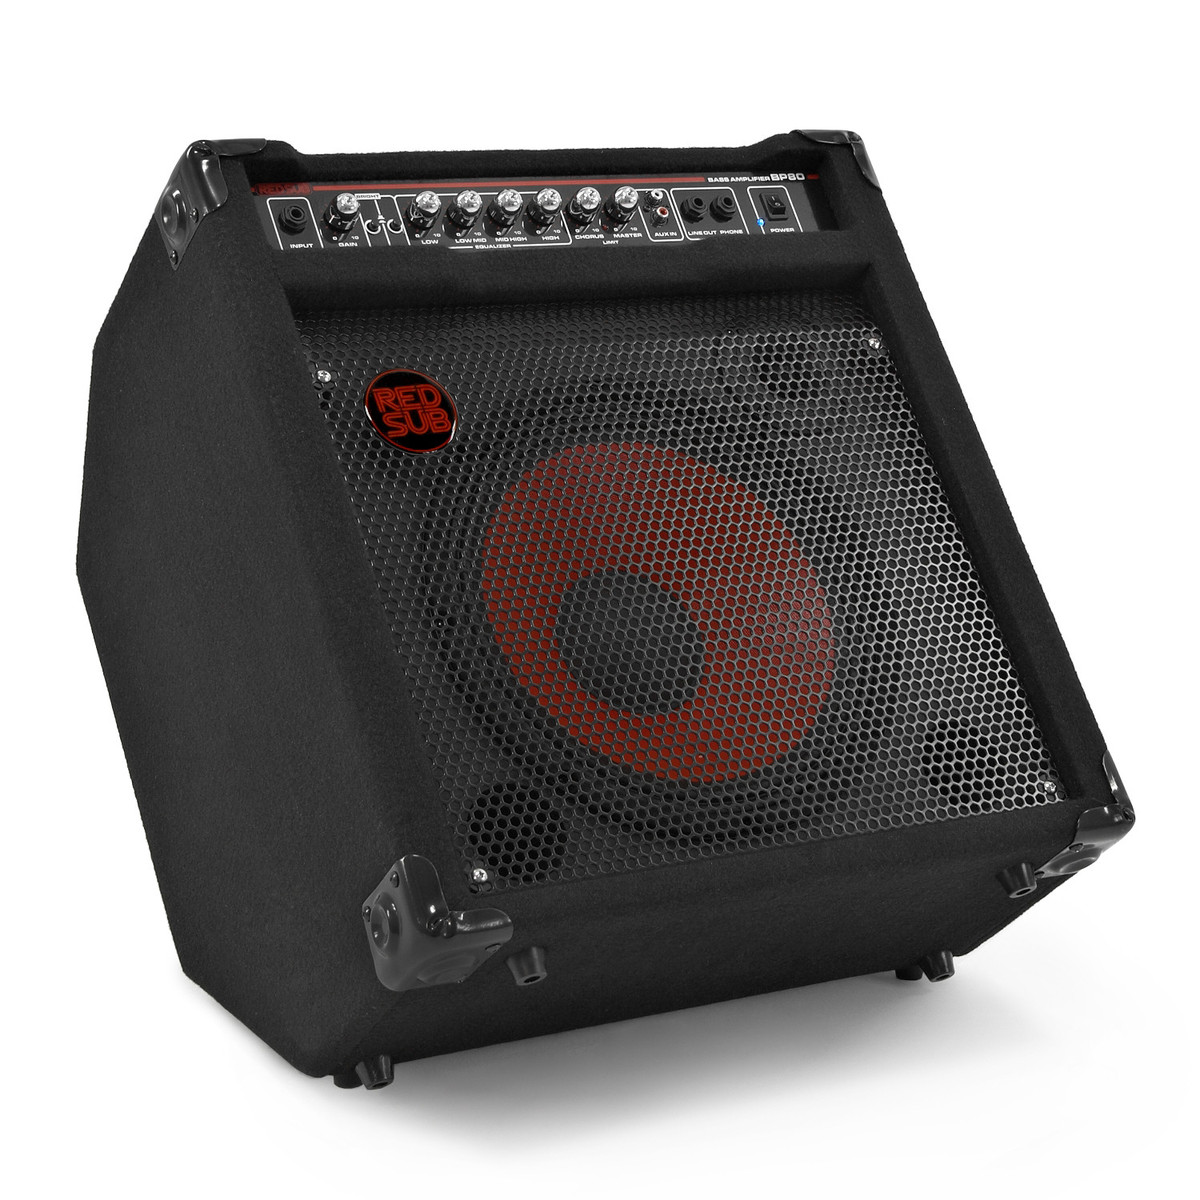 redsub bp80 80w bass guitar amplifier b stock at gear4music. Black Bedroom Furniture Sets. Home Design Ideas